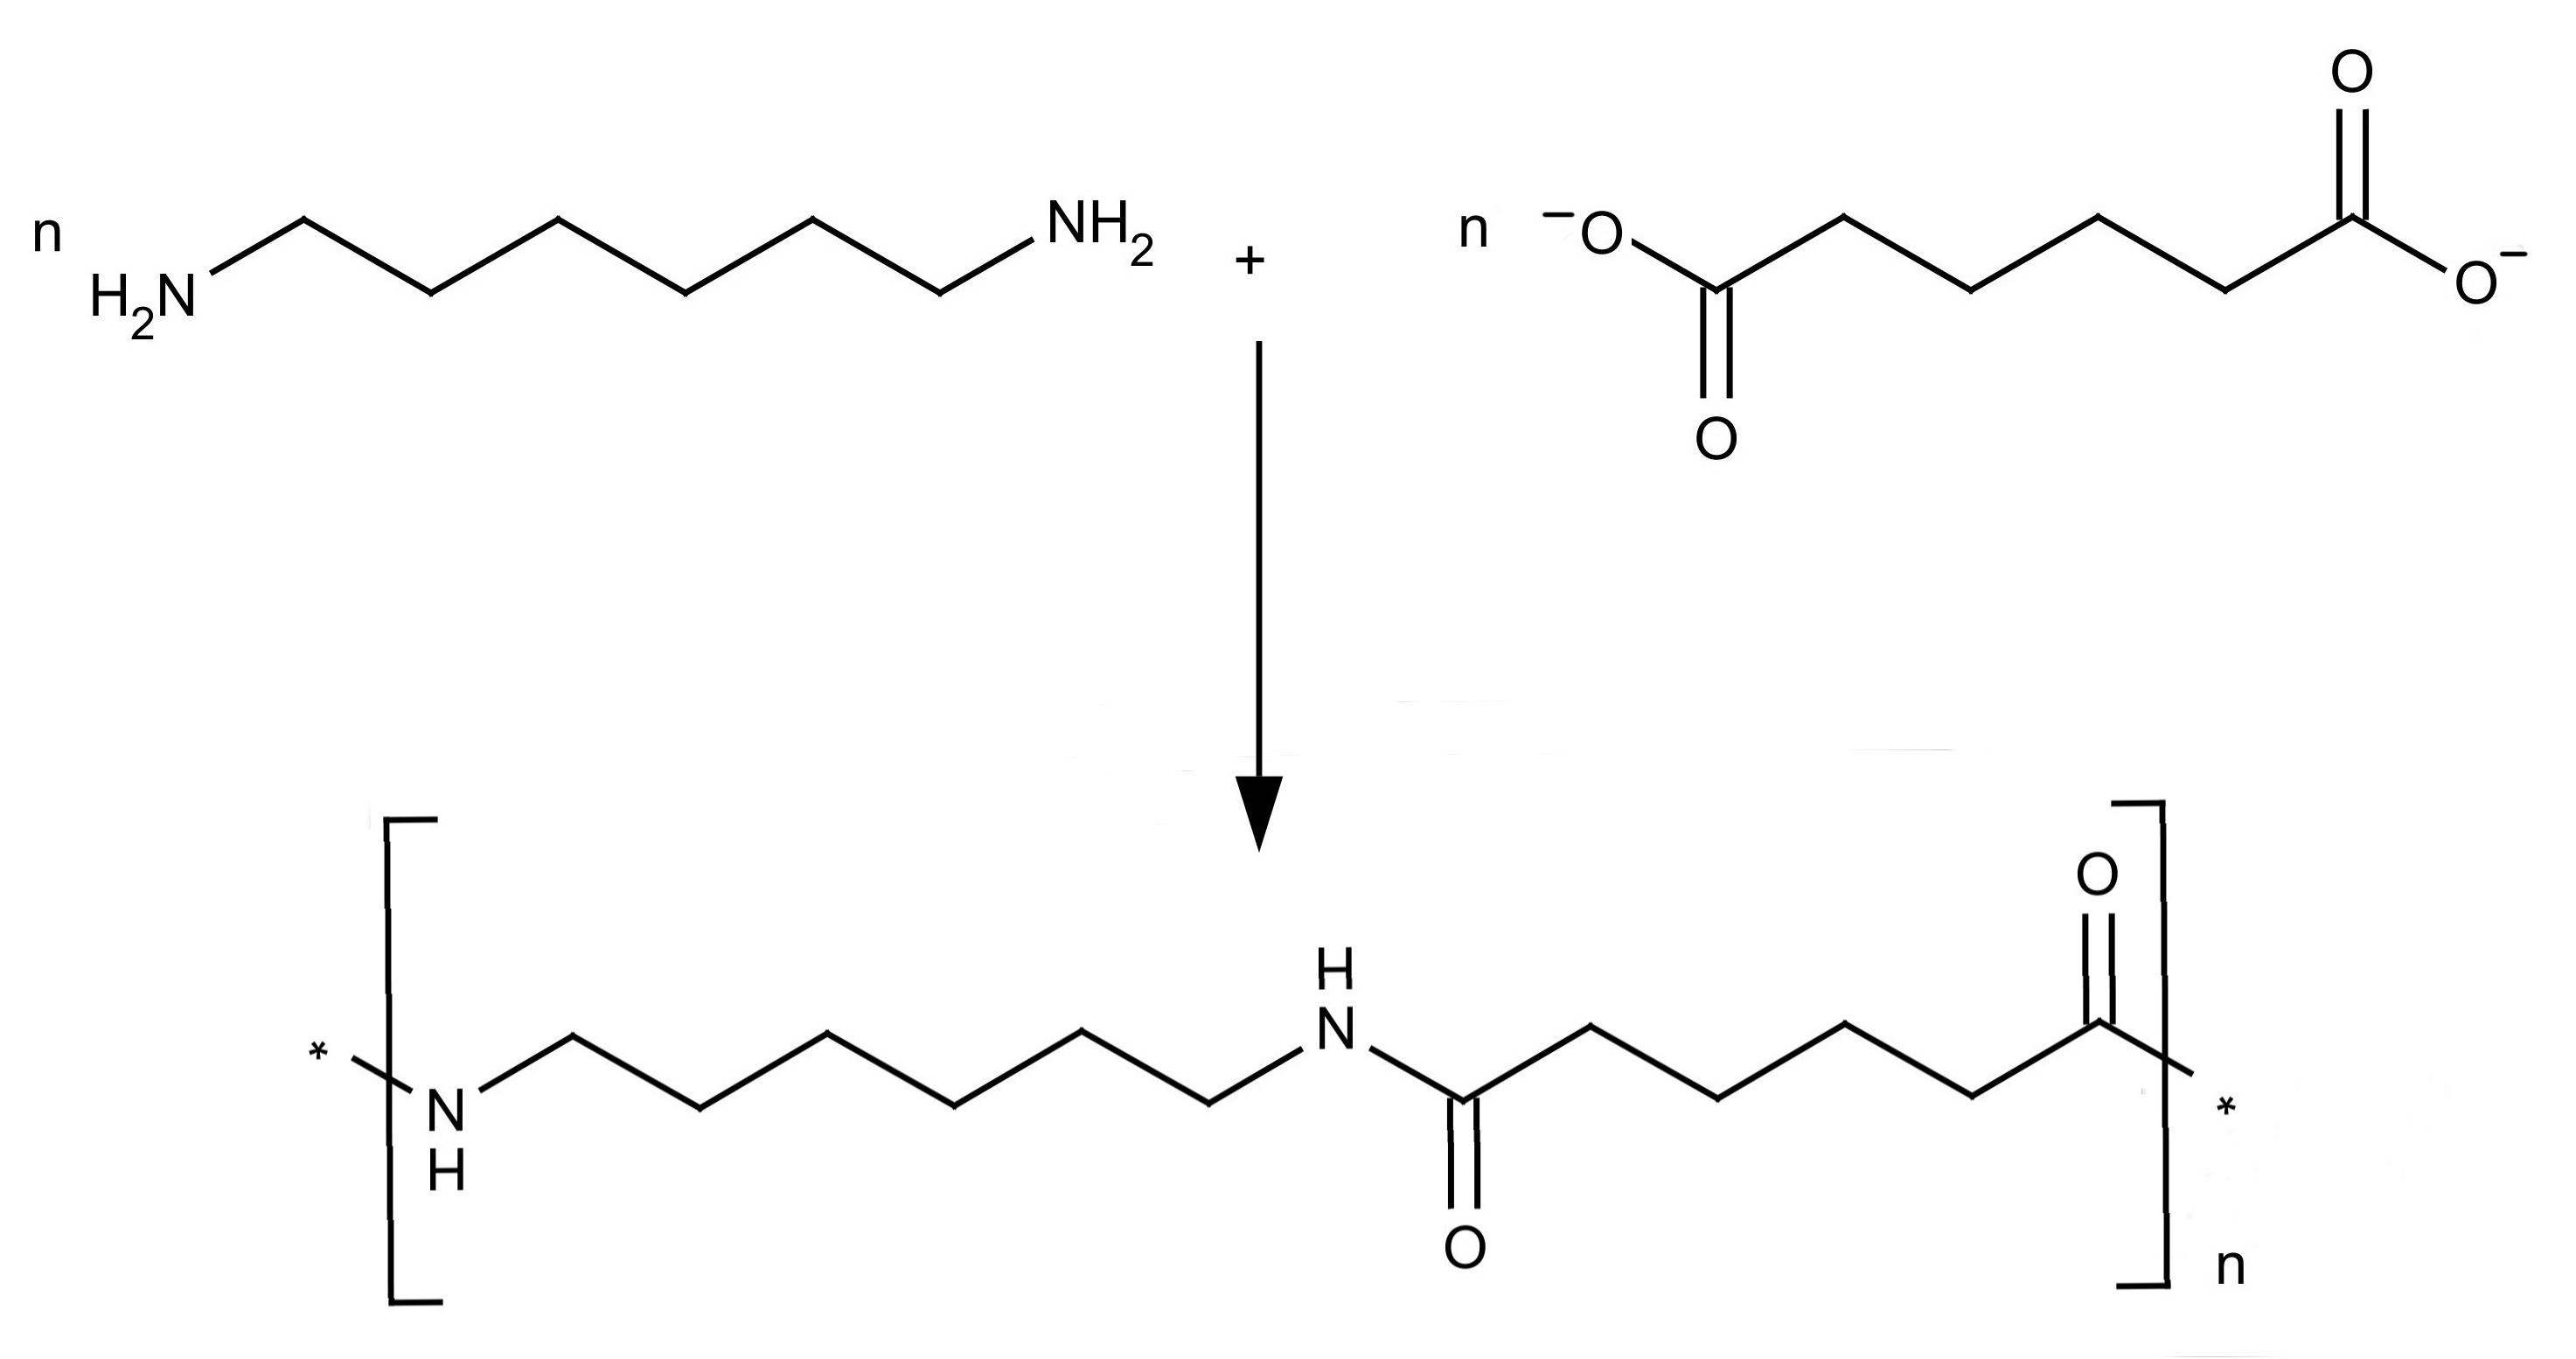 Nylon 6 Proces Flow Diagram